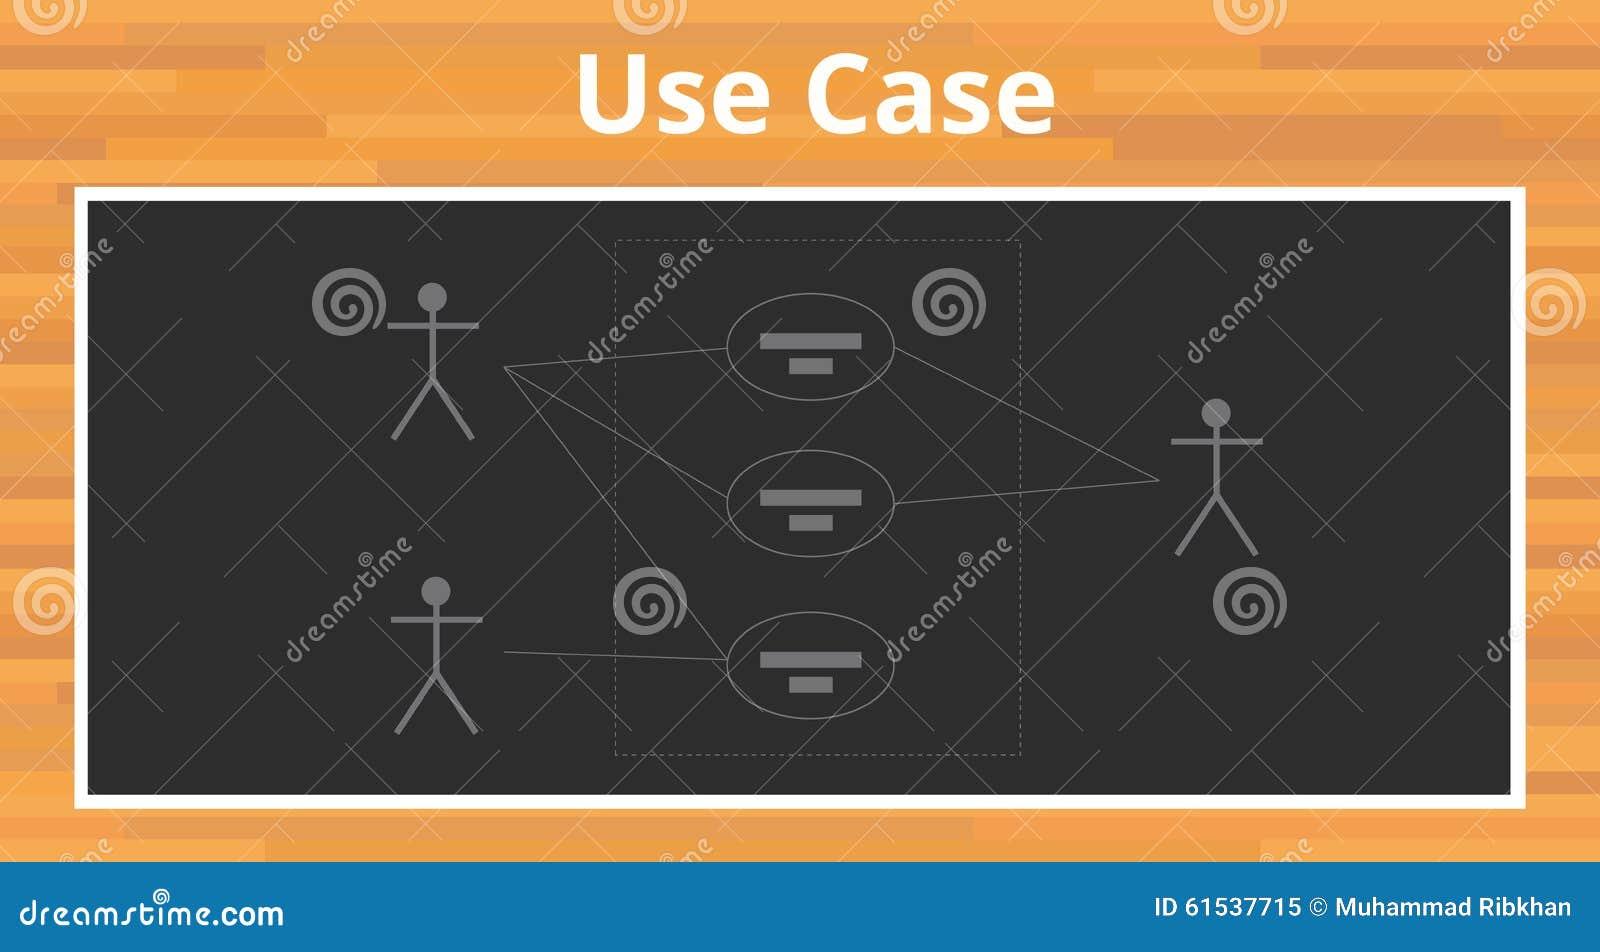 Uml Unified Modelling Language Use Case Diagram Stock Vector